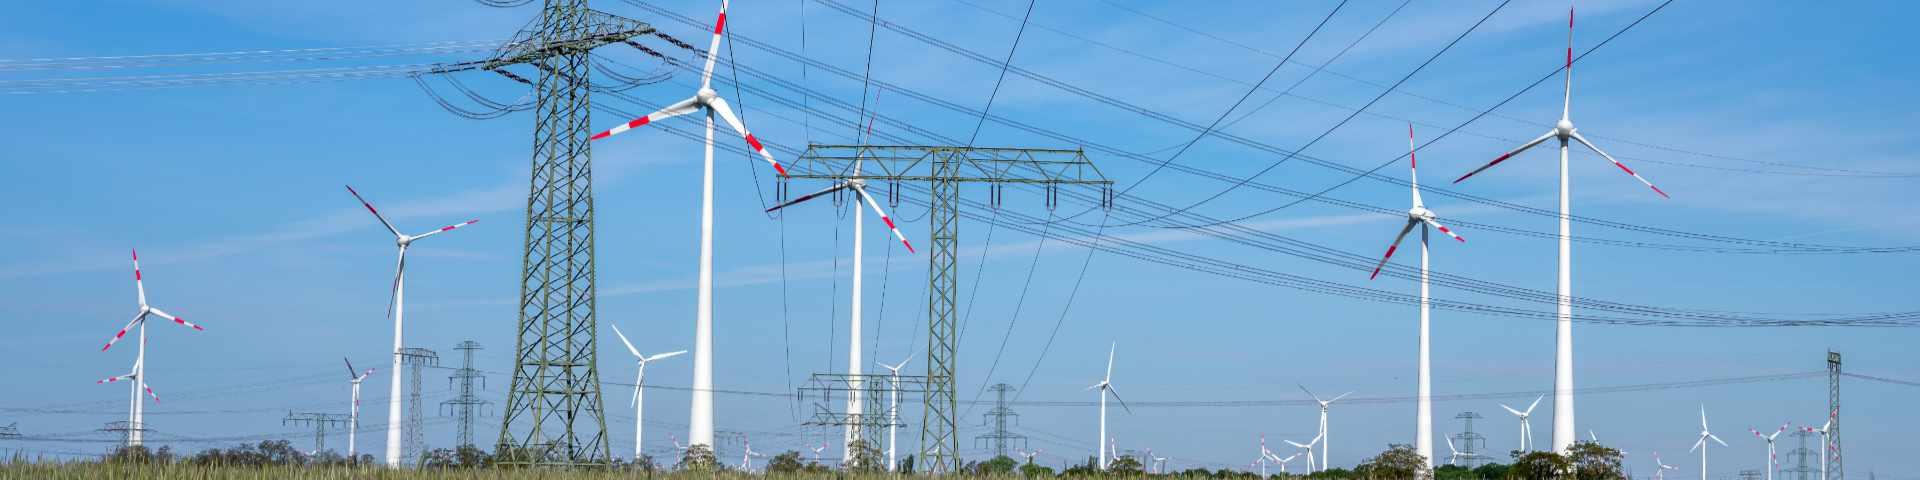 Gedragscode Consument en Energieleverancier